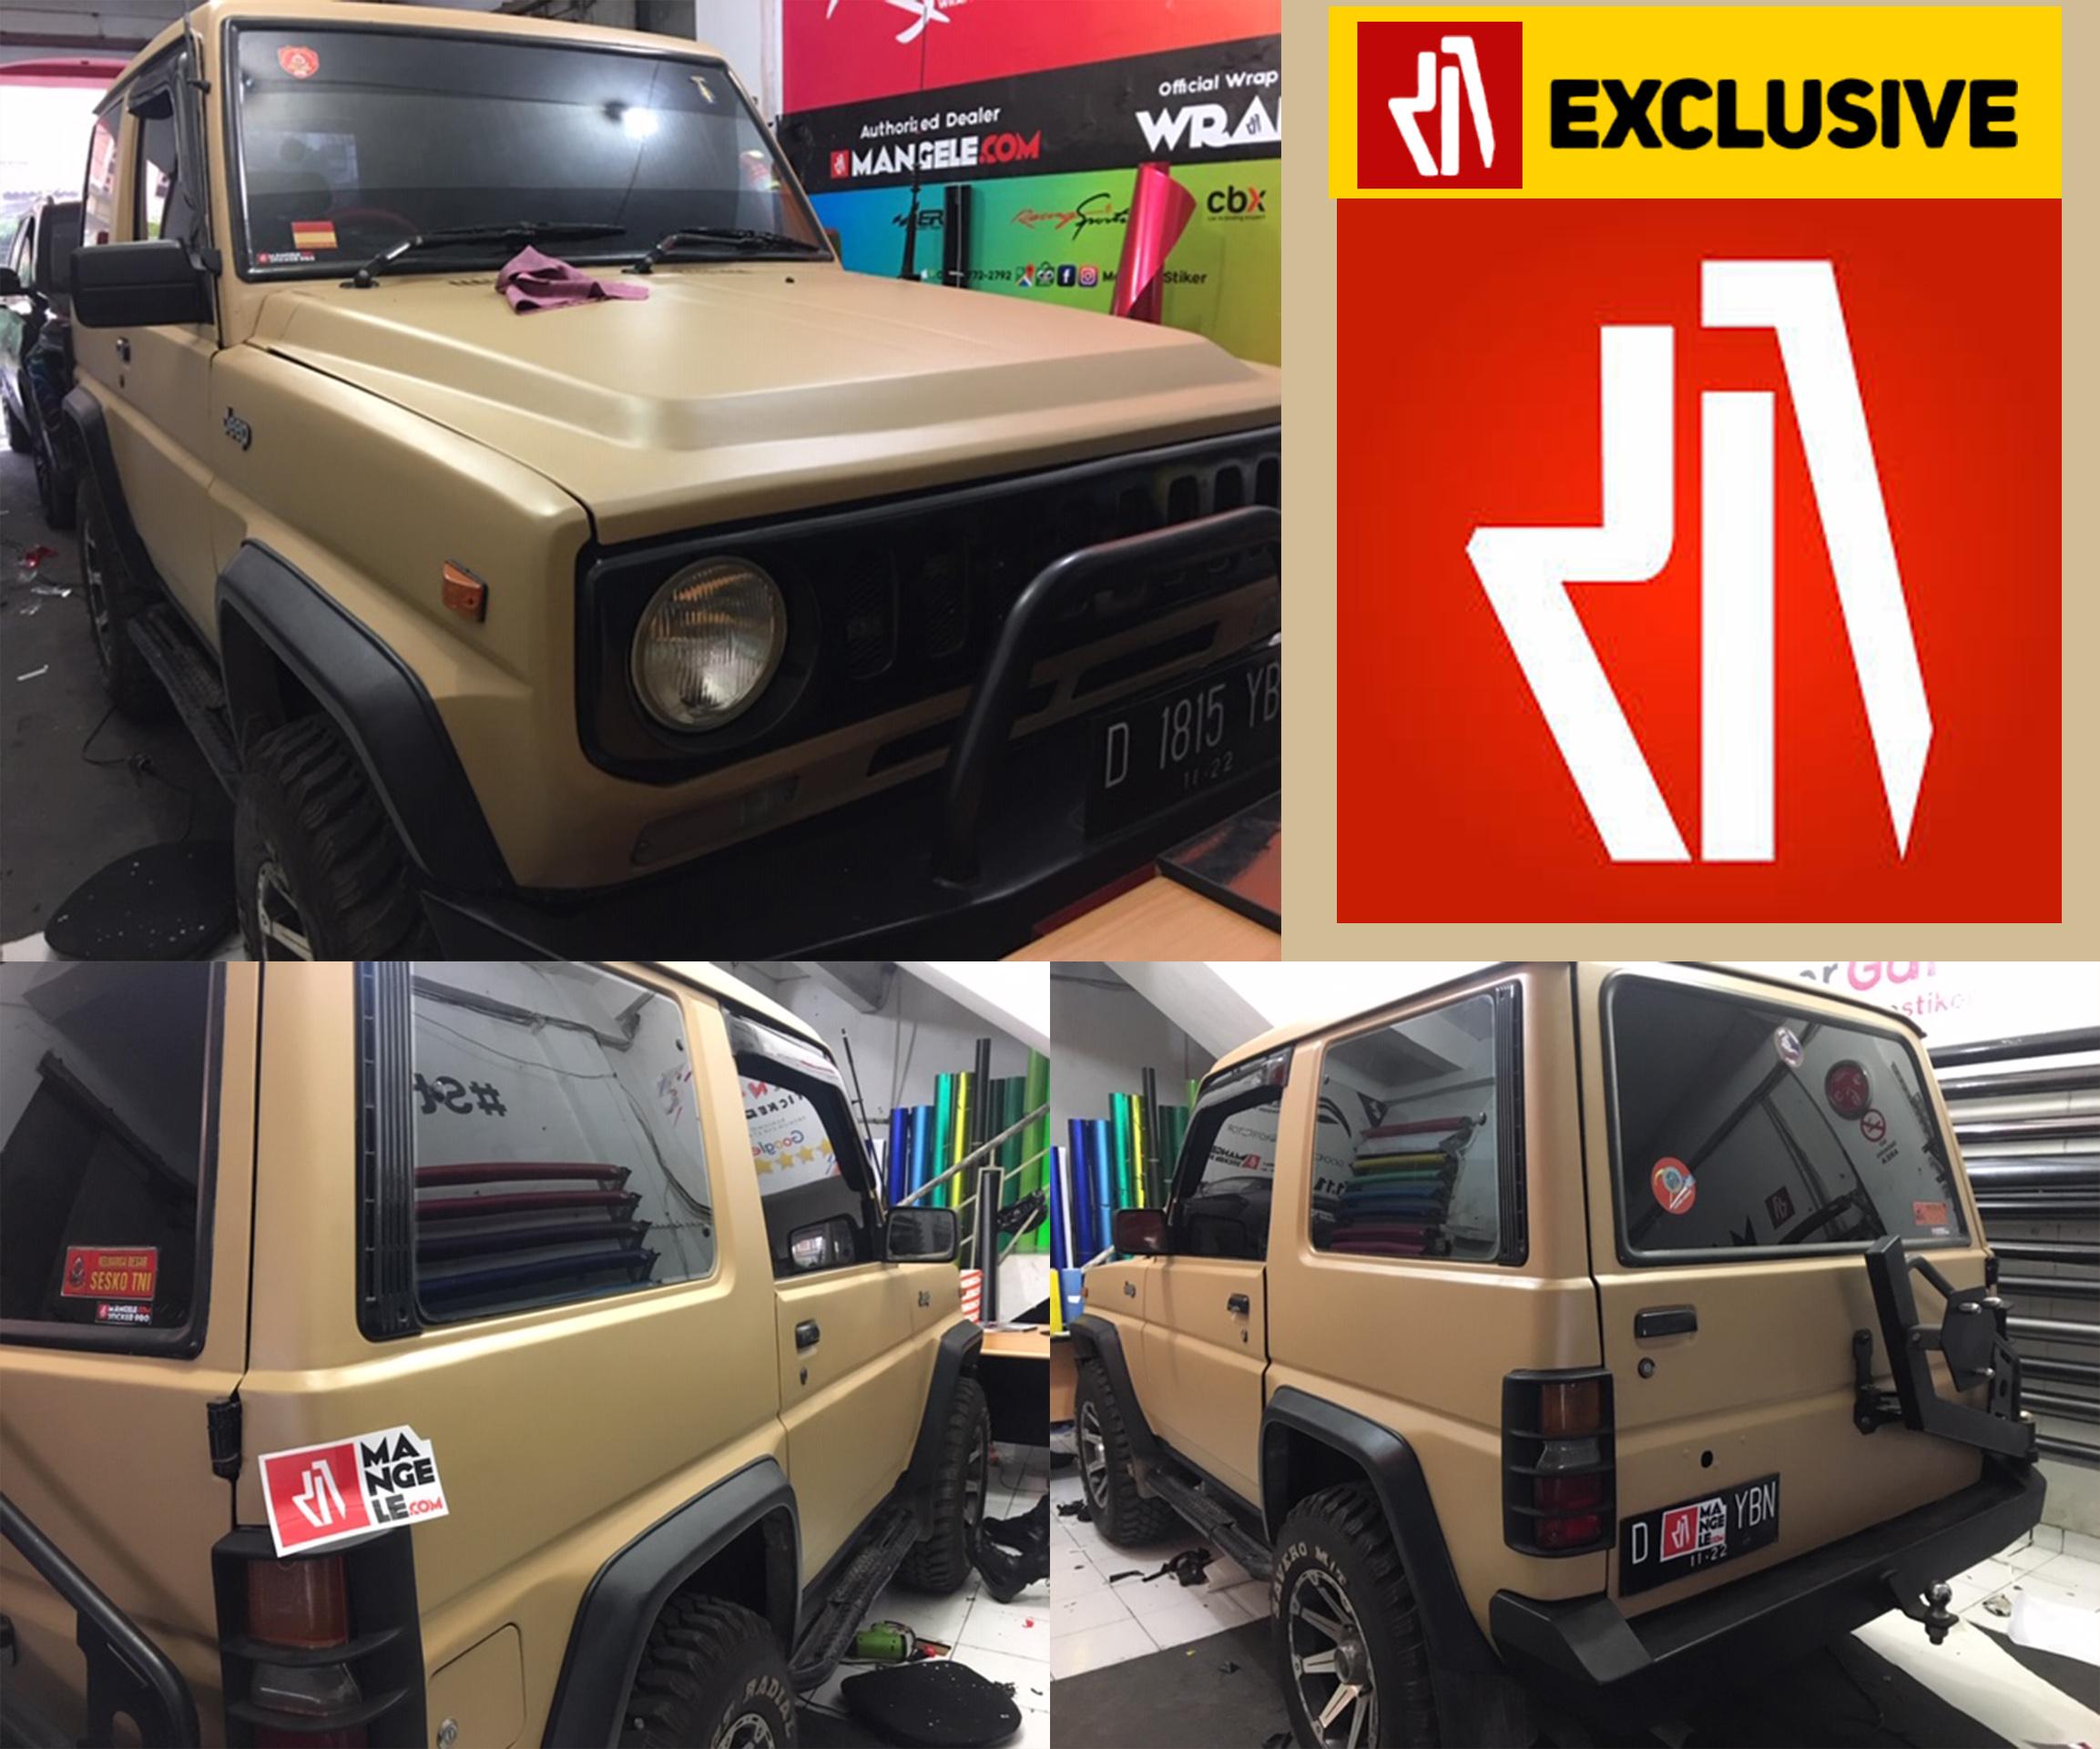 Keren! Tampil Exclusive dgn Stiker Mobil Premium Mangele Bandung